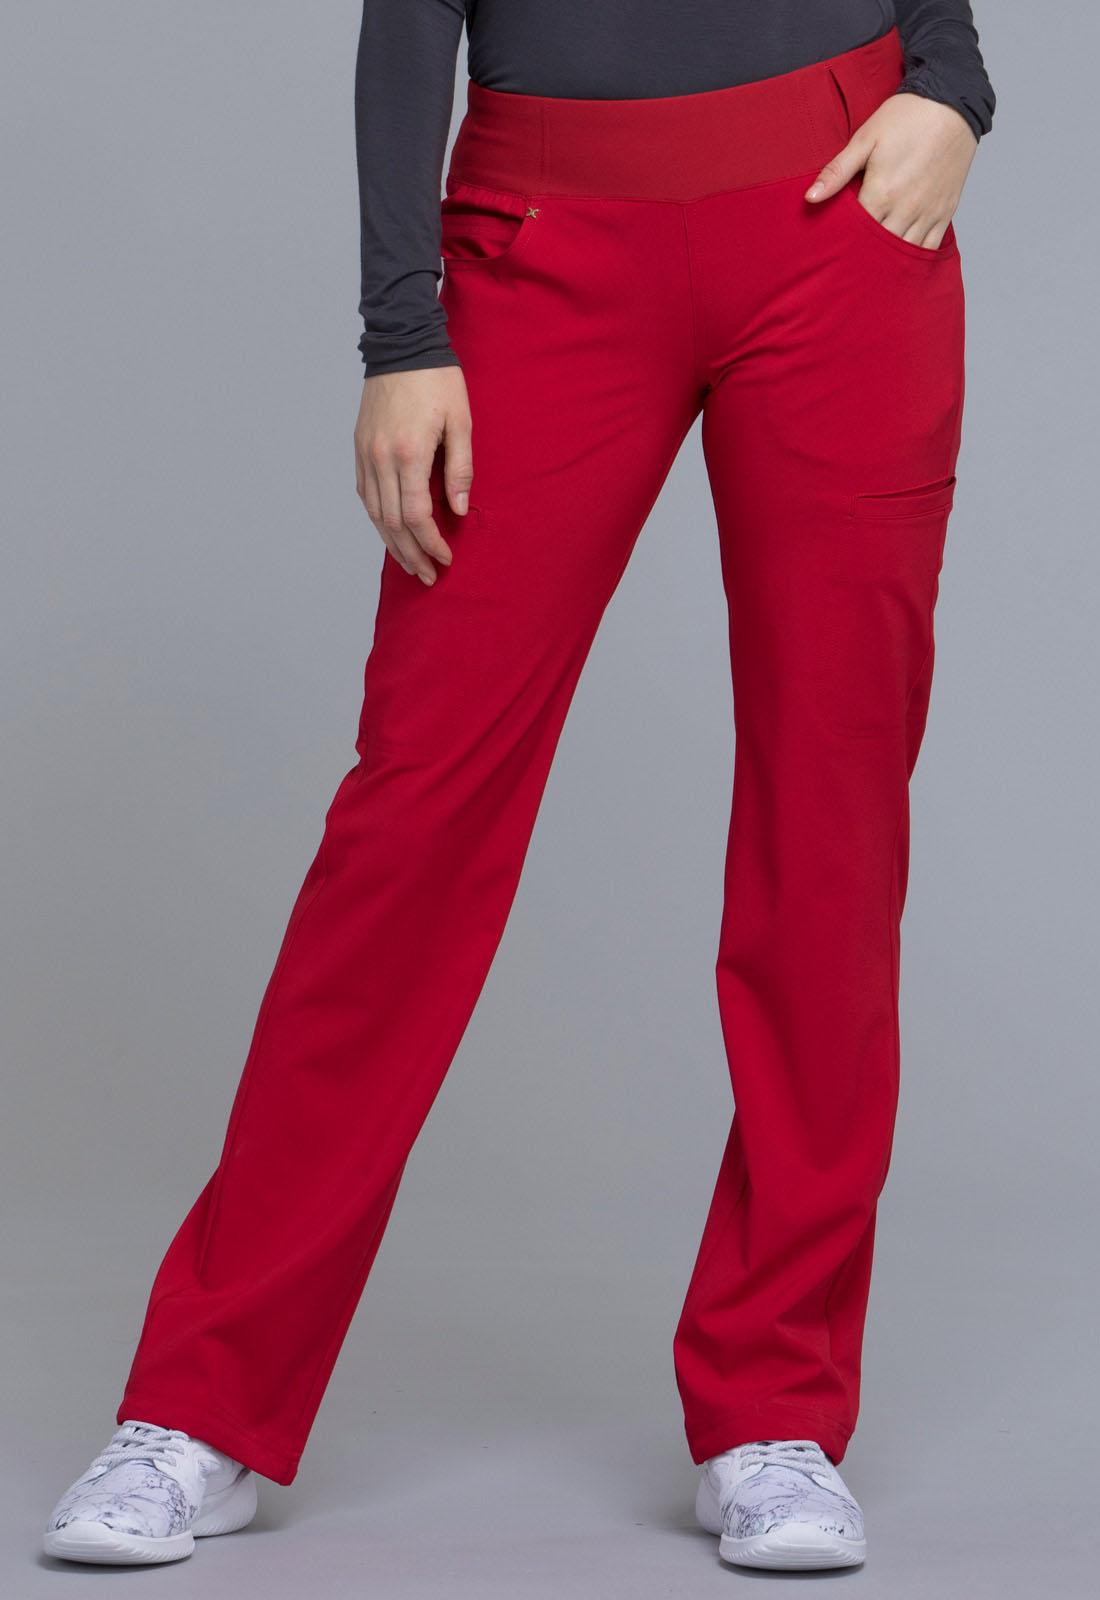 Mid Rise Straight Leg Pull-on Pant  CK002T